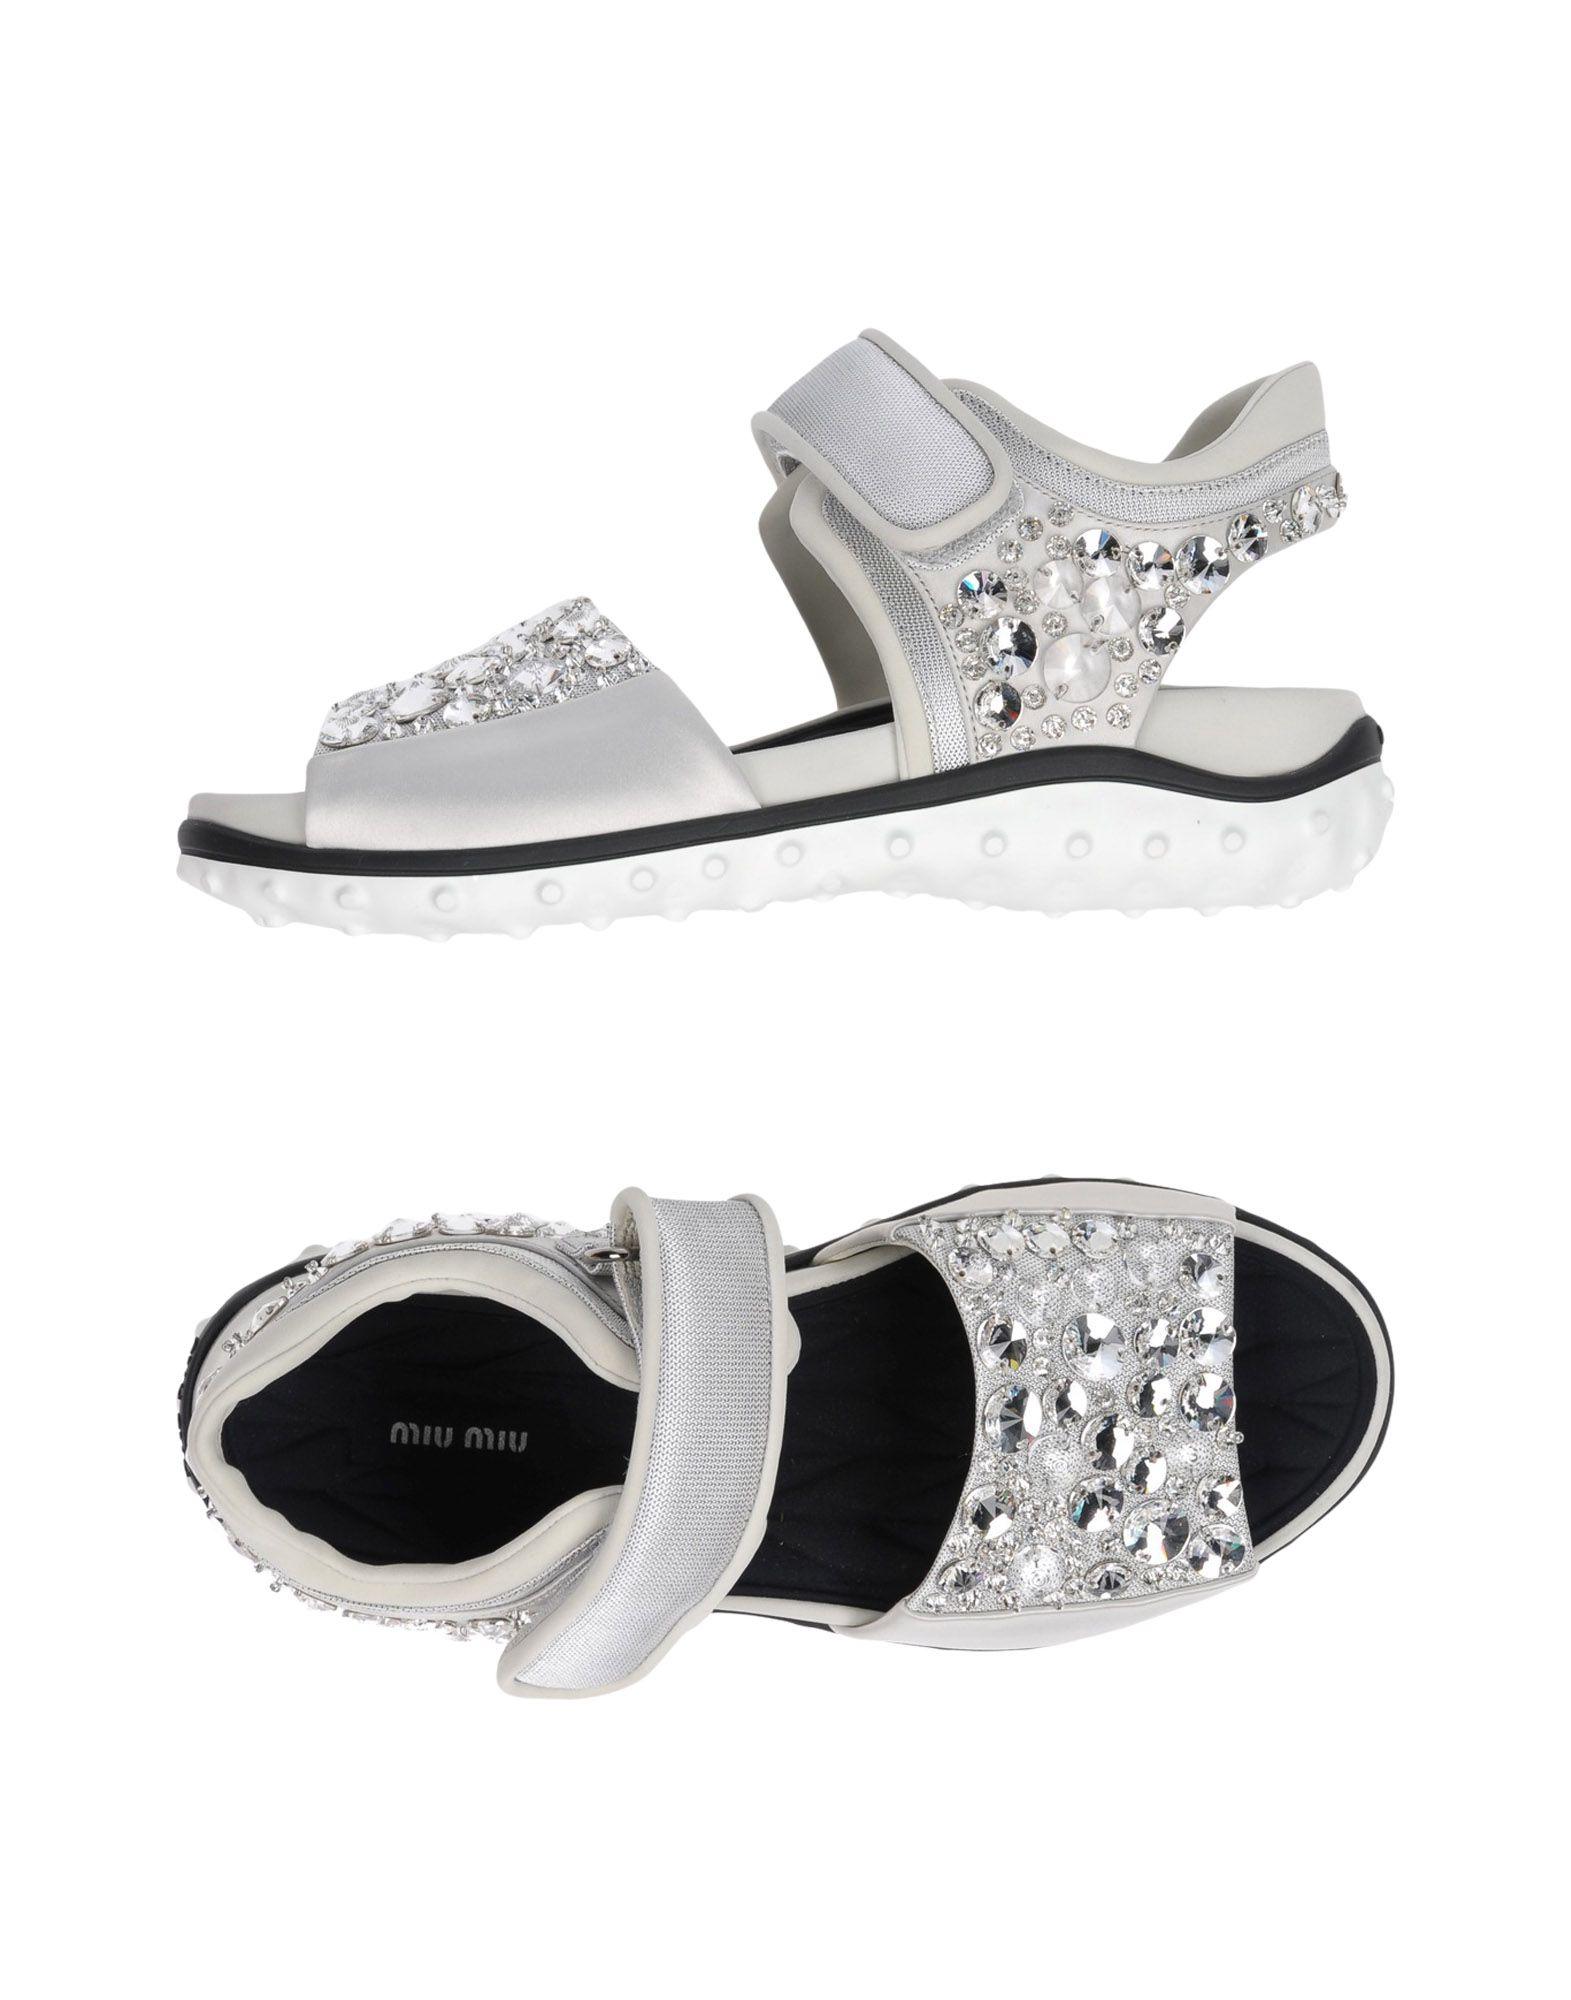 Miu Miu Sandals - Women Miu Miu Sandals Kingdom online on  United Kingdom Sandals - 11438971QO 6edc42